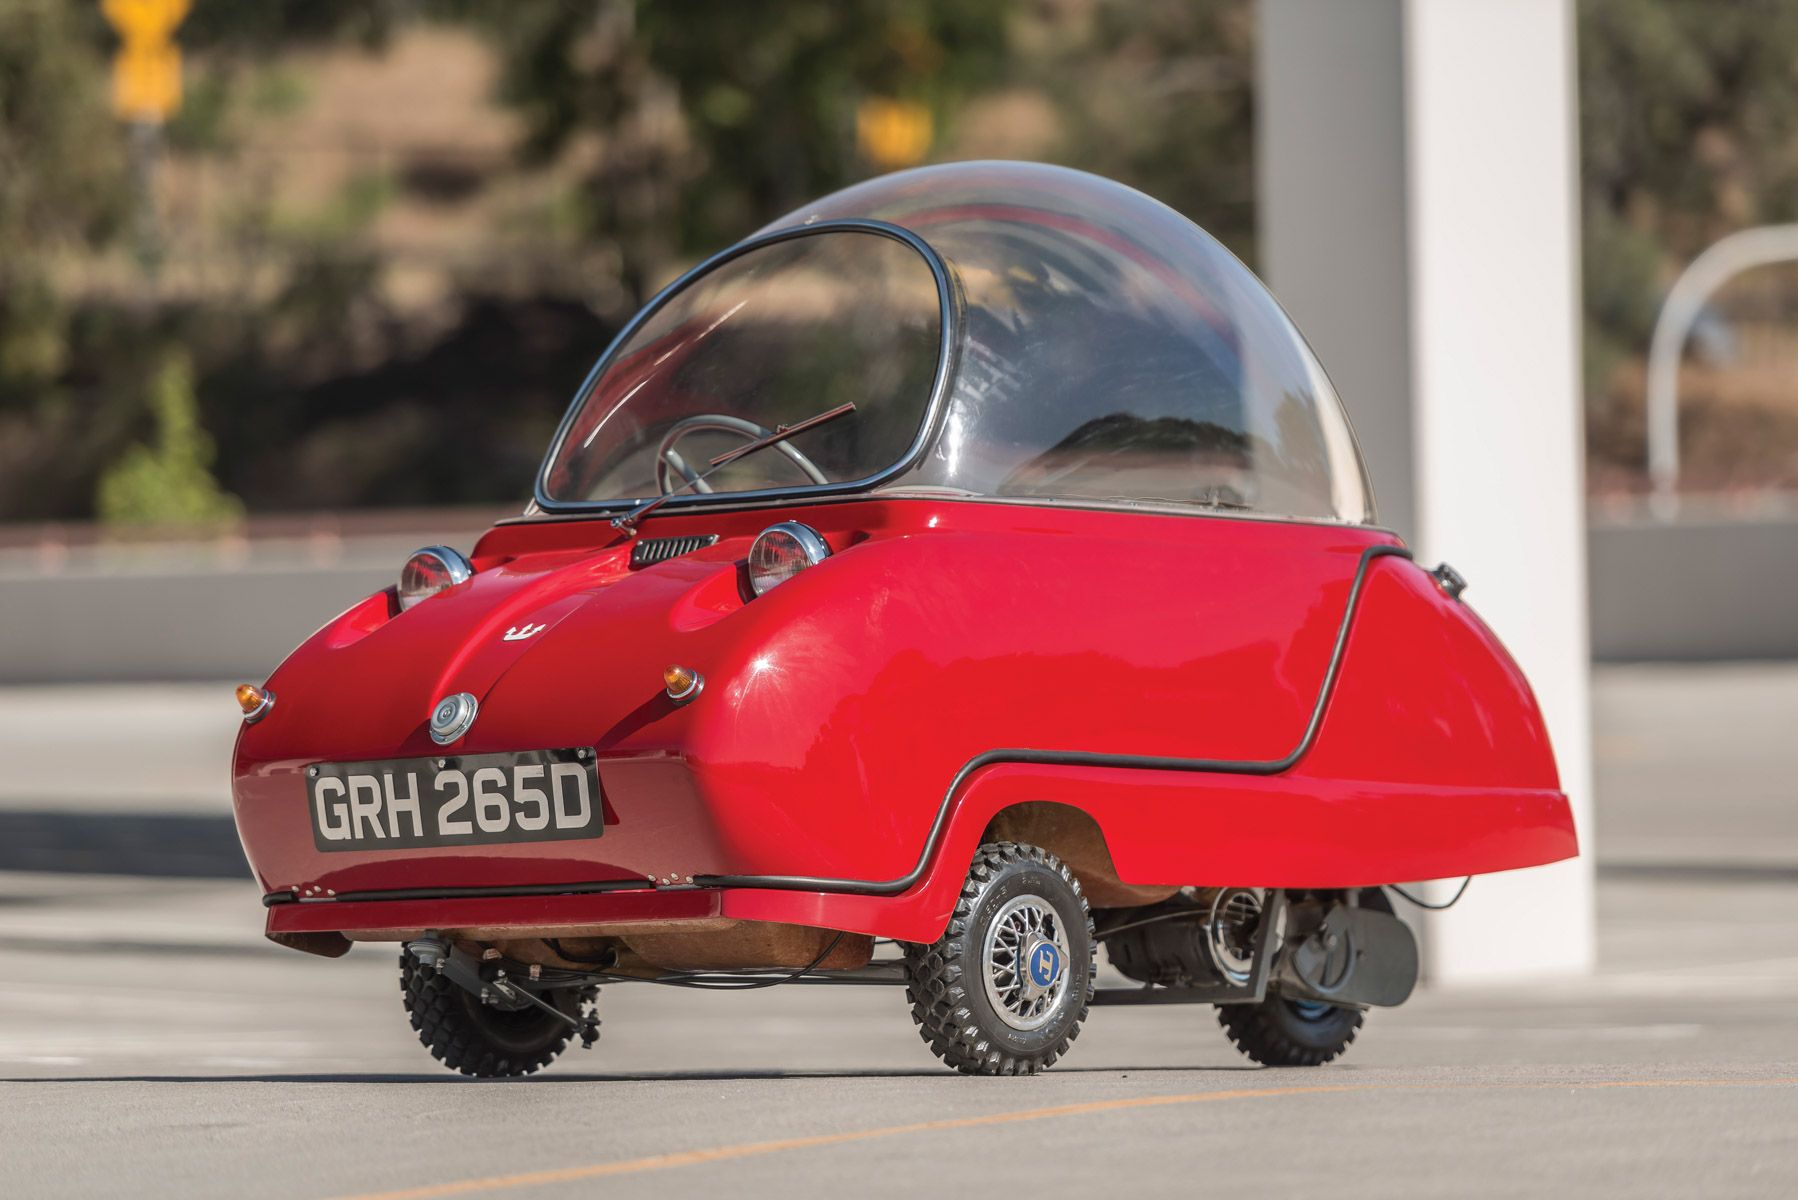 The Peel Trident Is A Retro Futuristic Oddity From The Isle Of Man Autos Fotografia Y Disenos De Unas